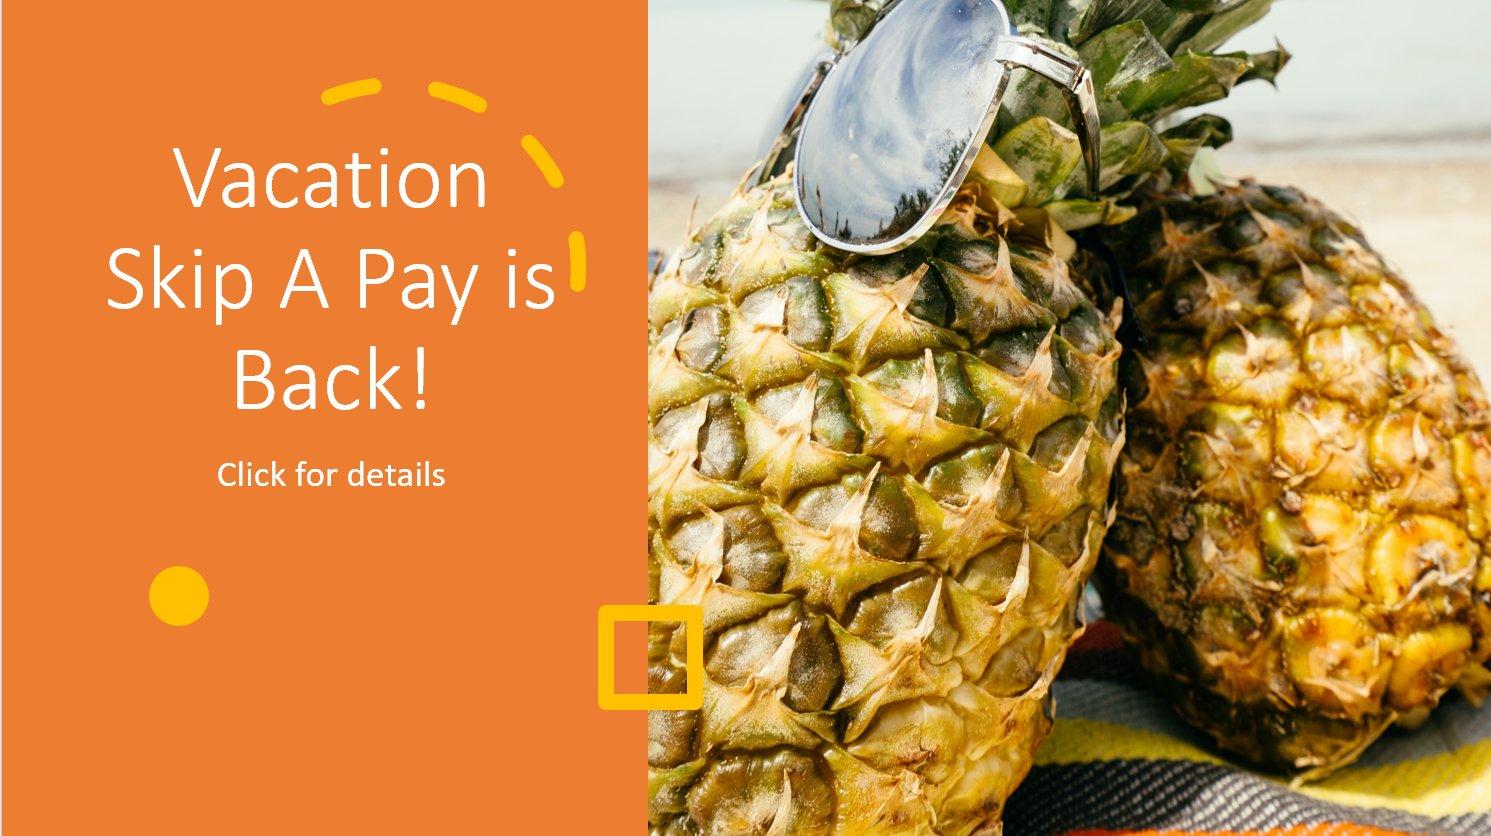 Vacation Skip A Pay